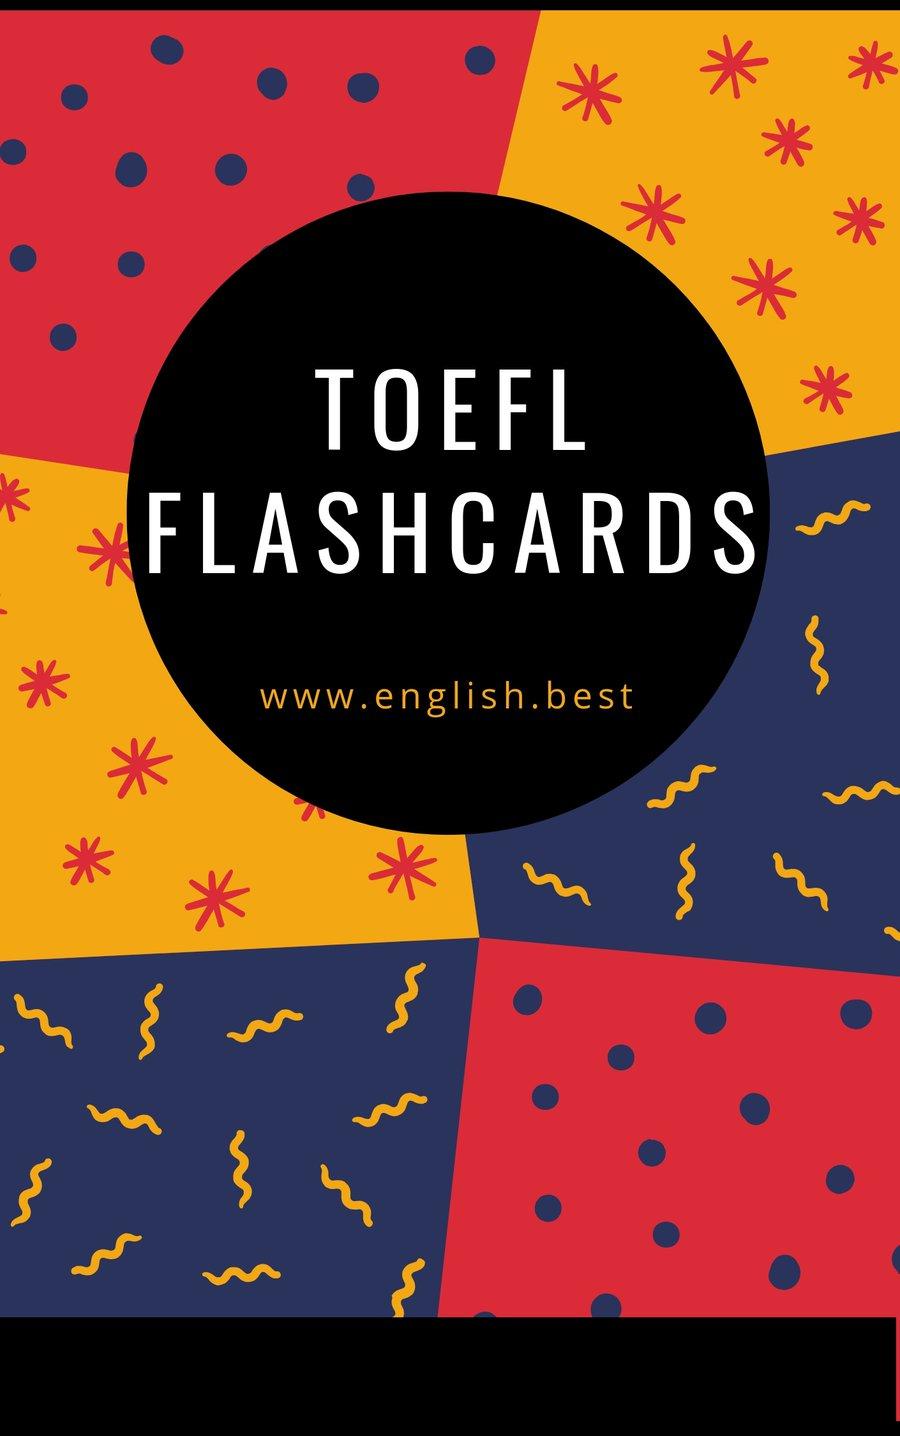 Toefl Flashcards (Pdf) | English.best Shop